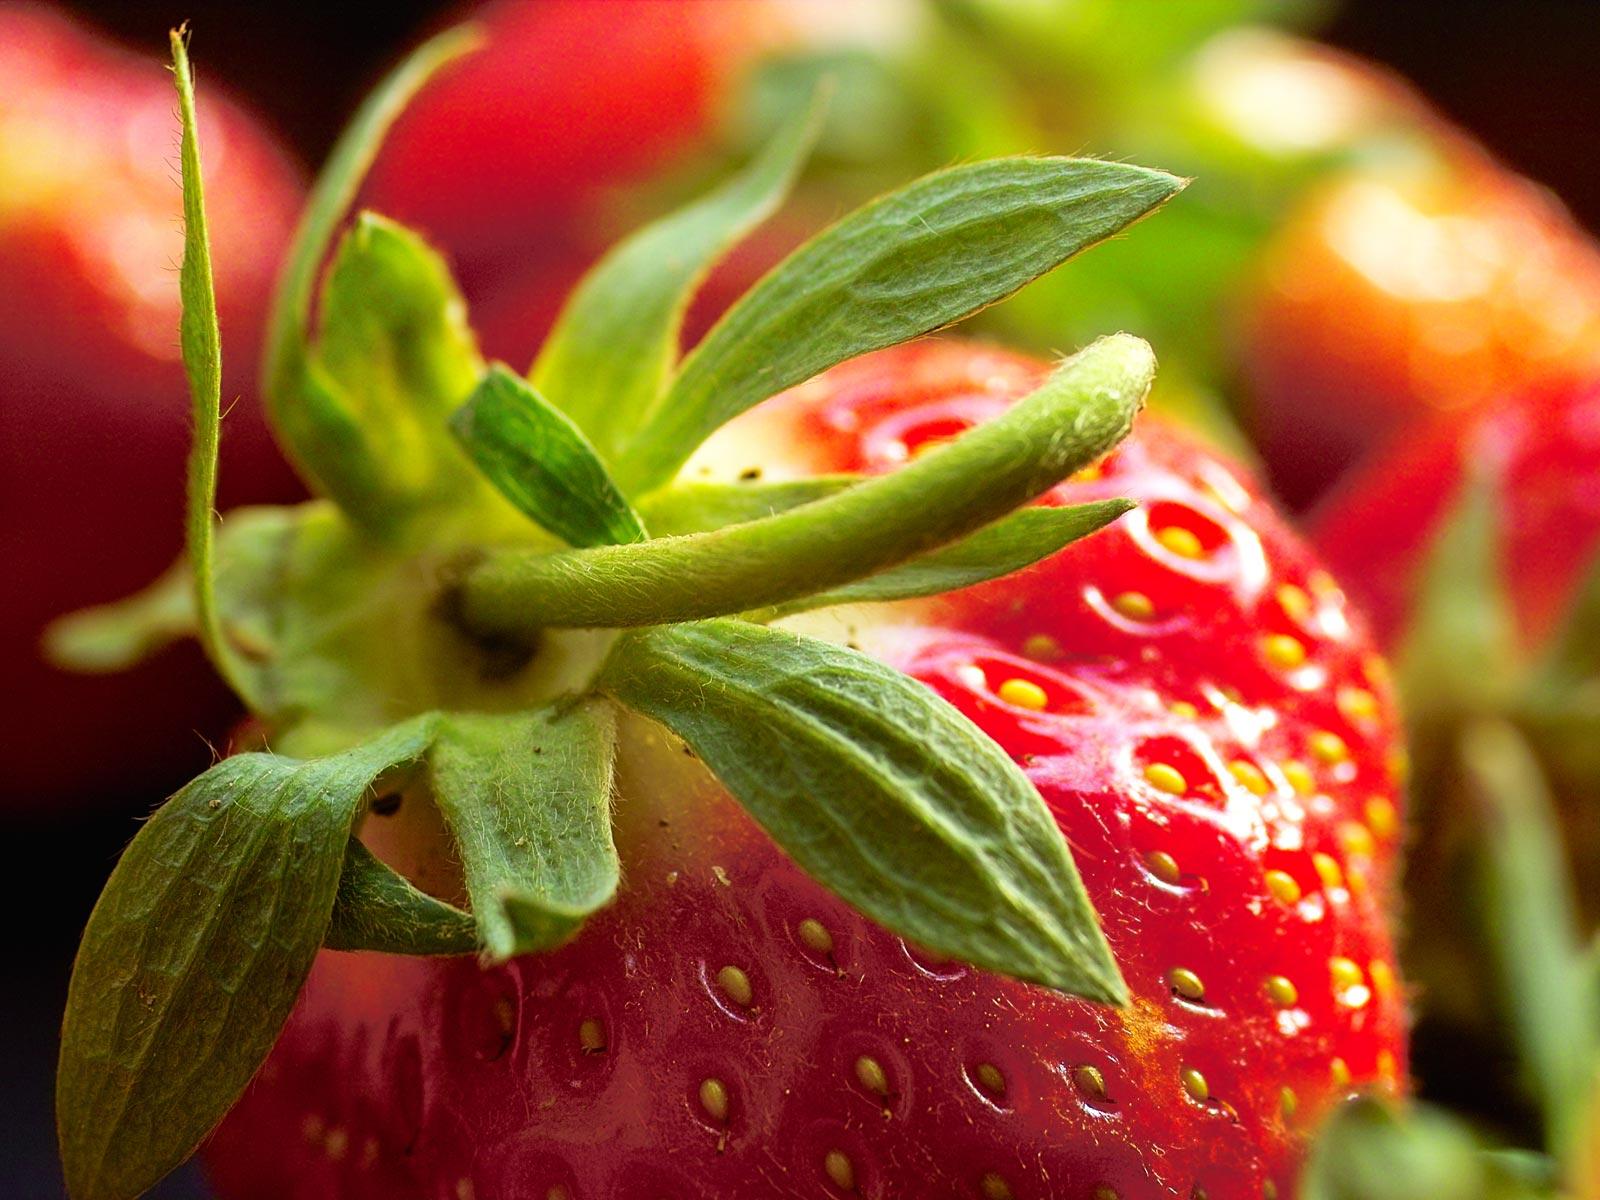 strawberries hd 38848